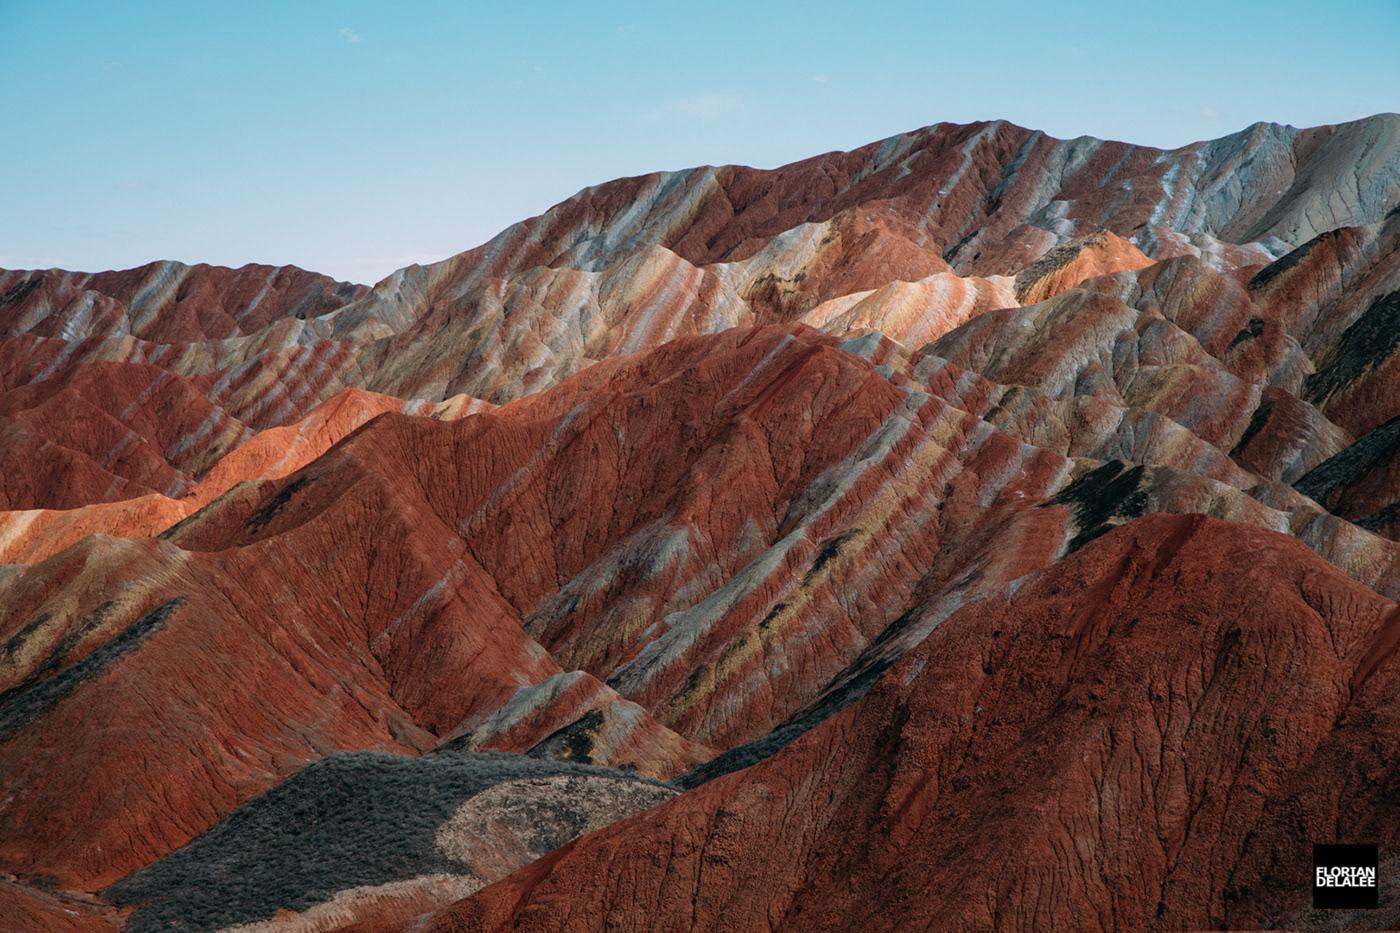 china Danxia Gansu Landform Landscape mountain red-coloured sandstones rock Zhangye